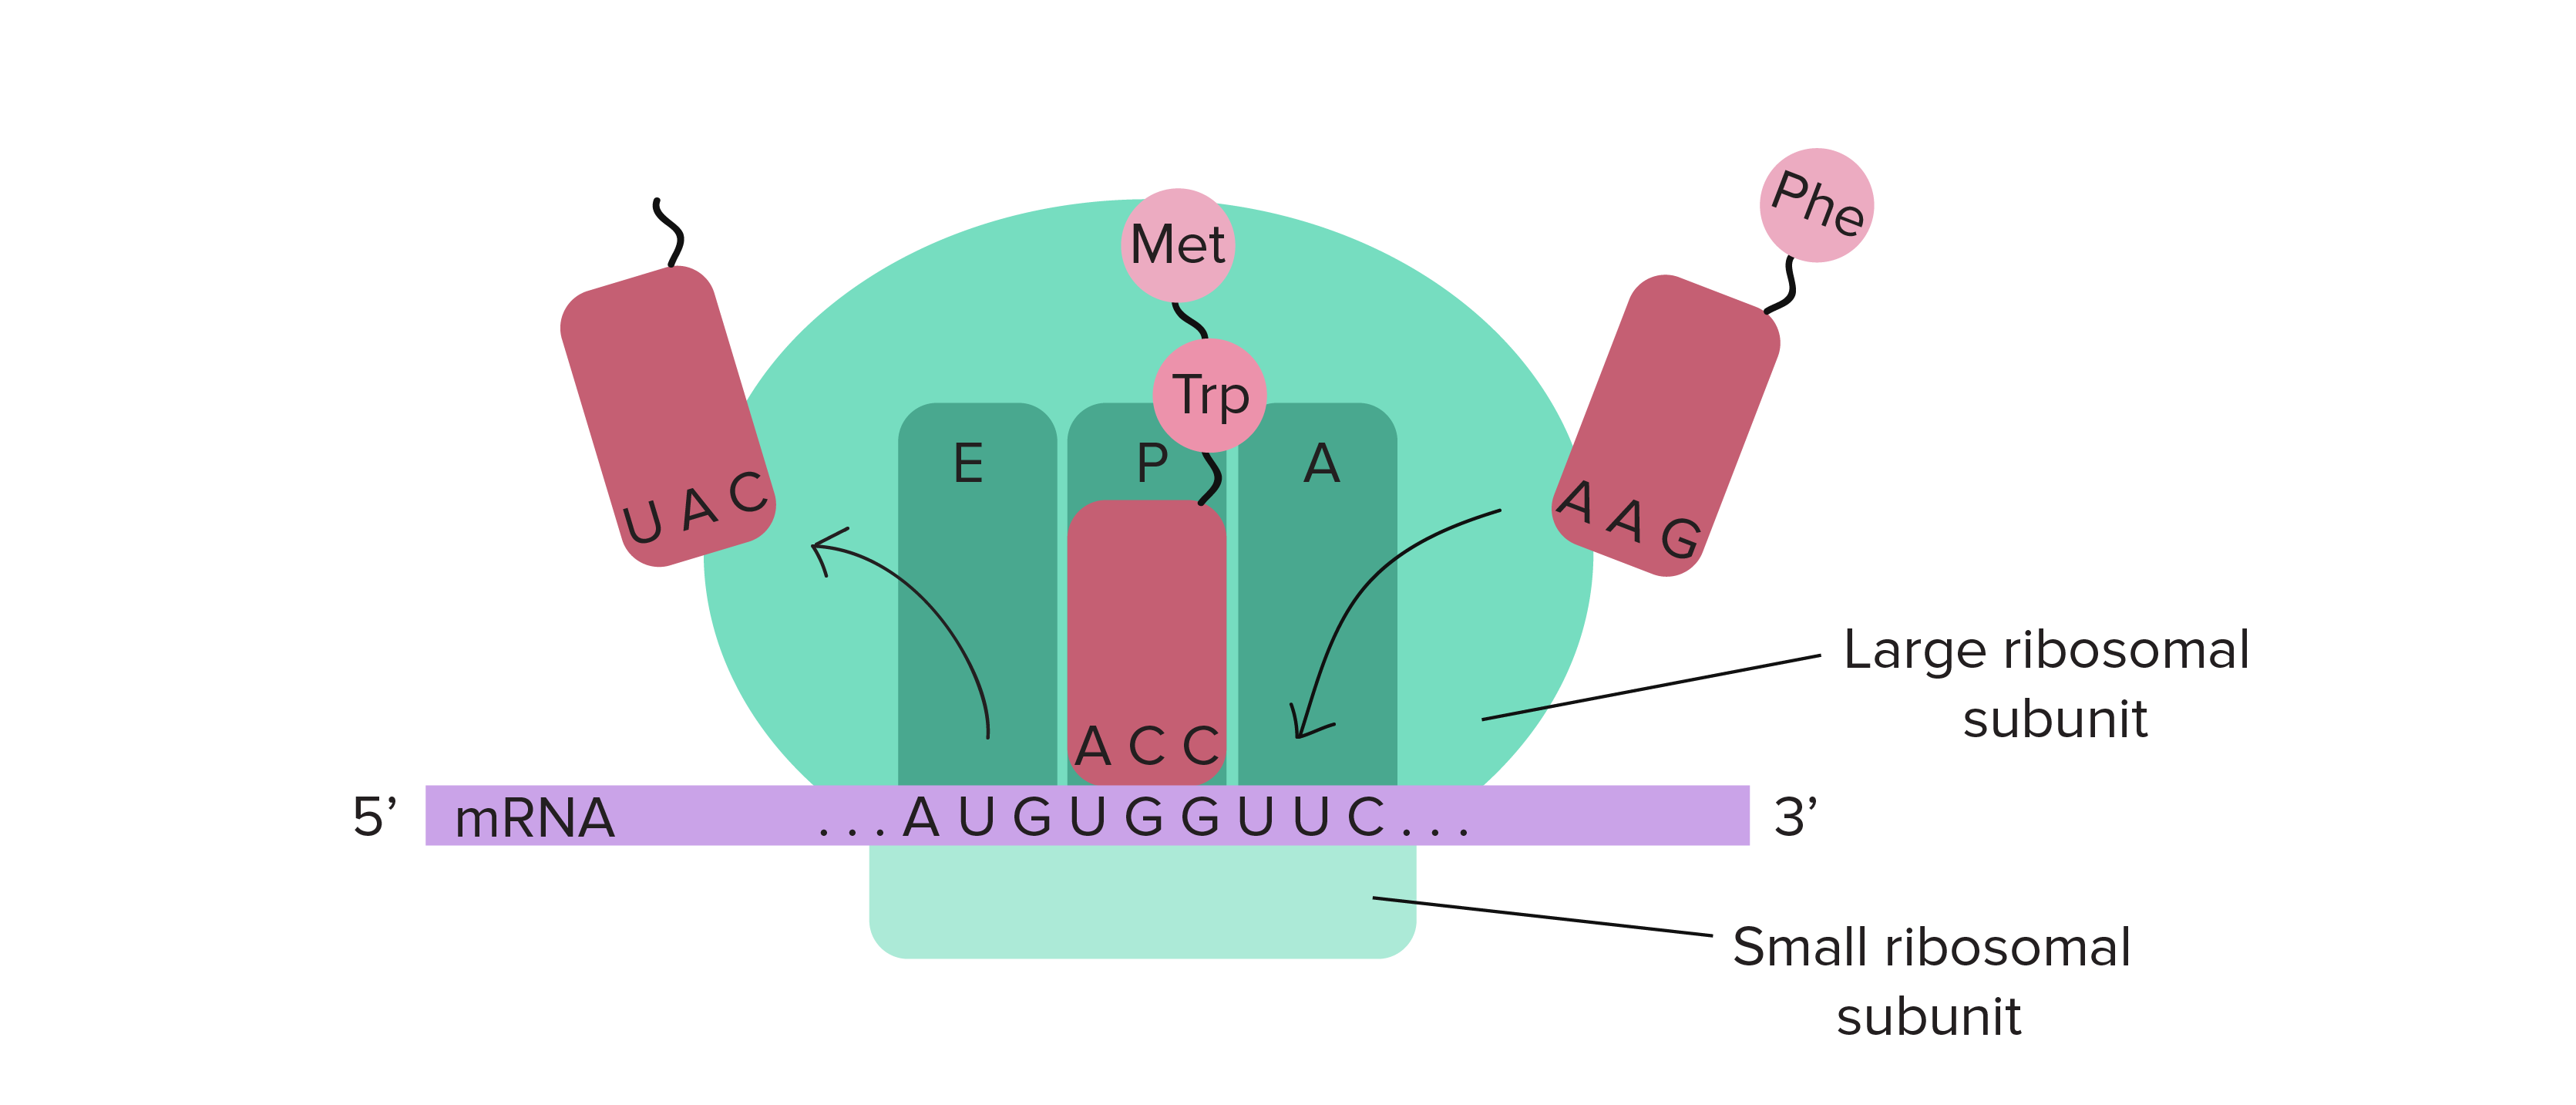 Trnas and ribosomes translation central dogma dna to rna to trnas and ribosomes translation central dogma dna to rna to protein ccuart Gallery